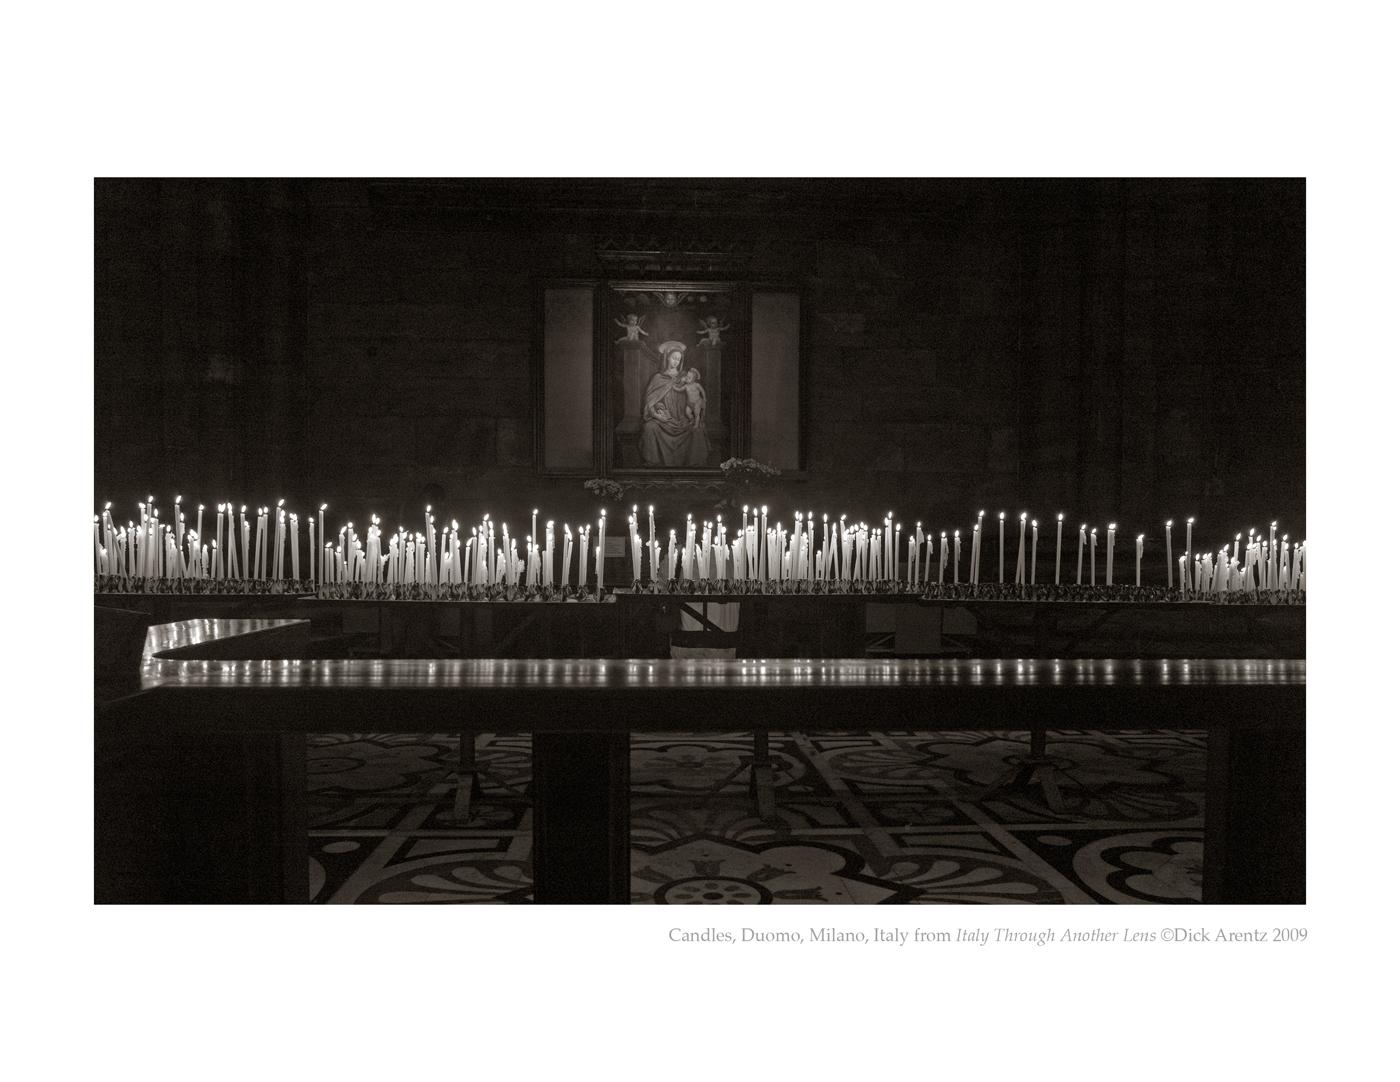 Candles, Duomo, Milano, Italy - Italy Through Another Lens